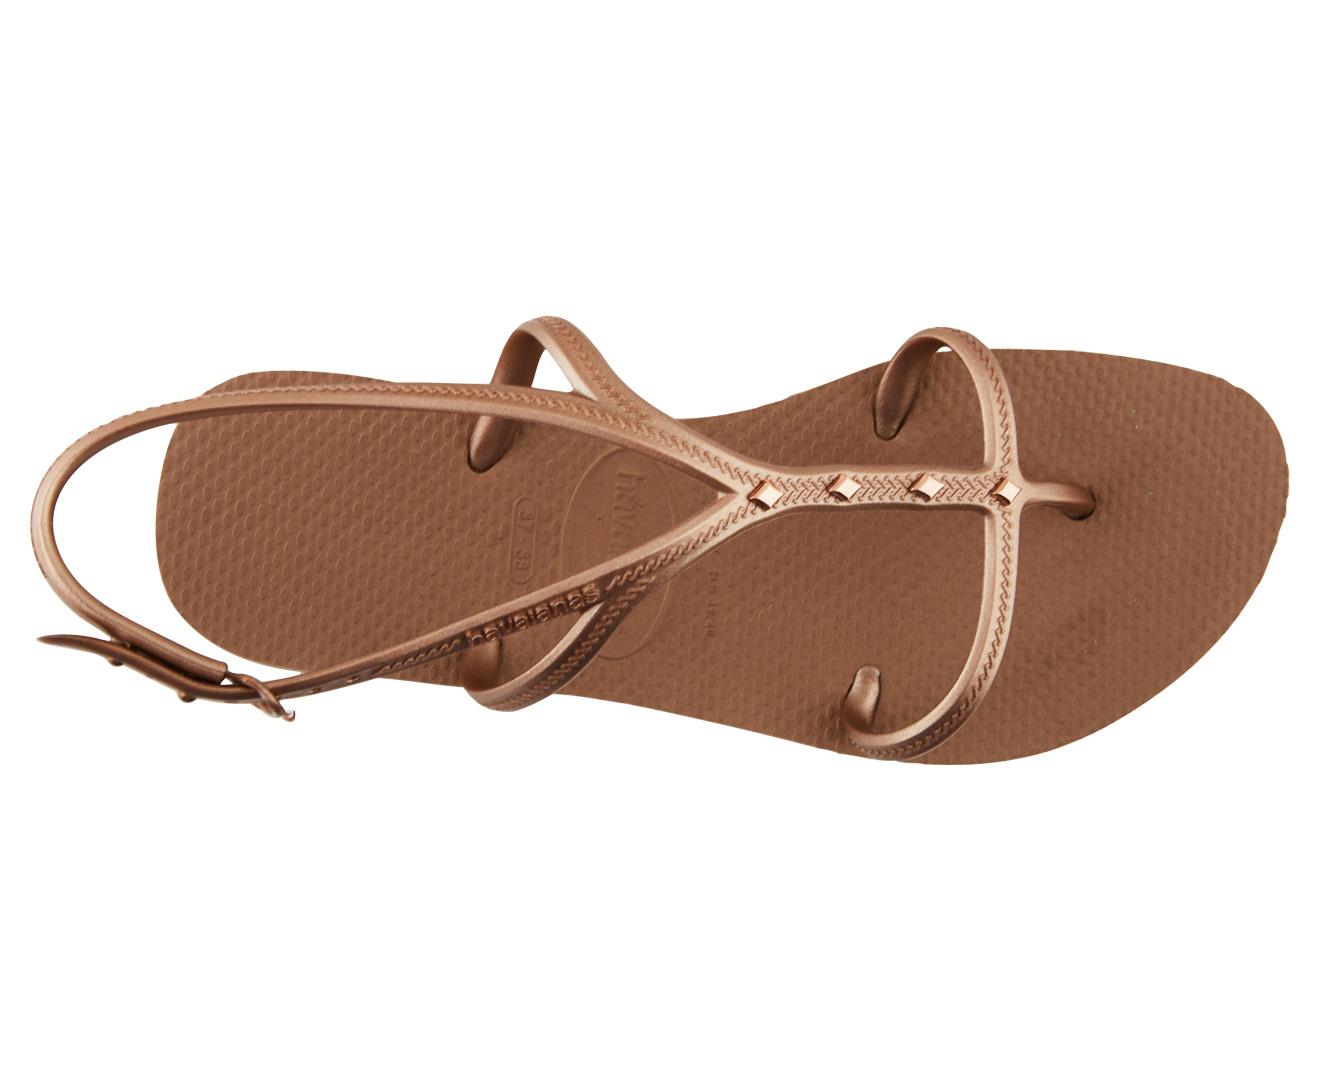 6ab397dd38f8 Havaianas Women s Allure Maxi Flip Flop w Strap - Rose Gold